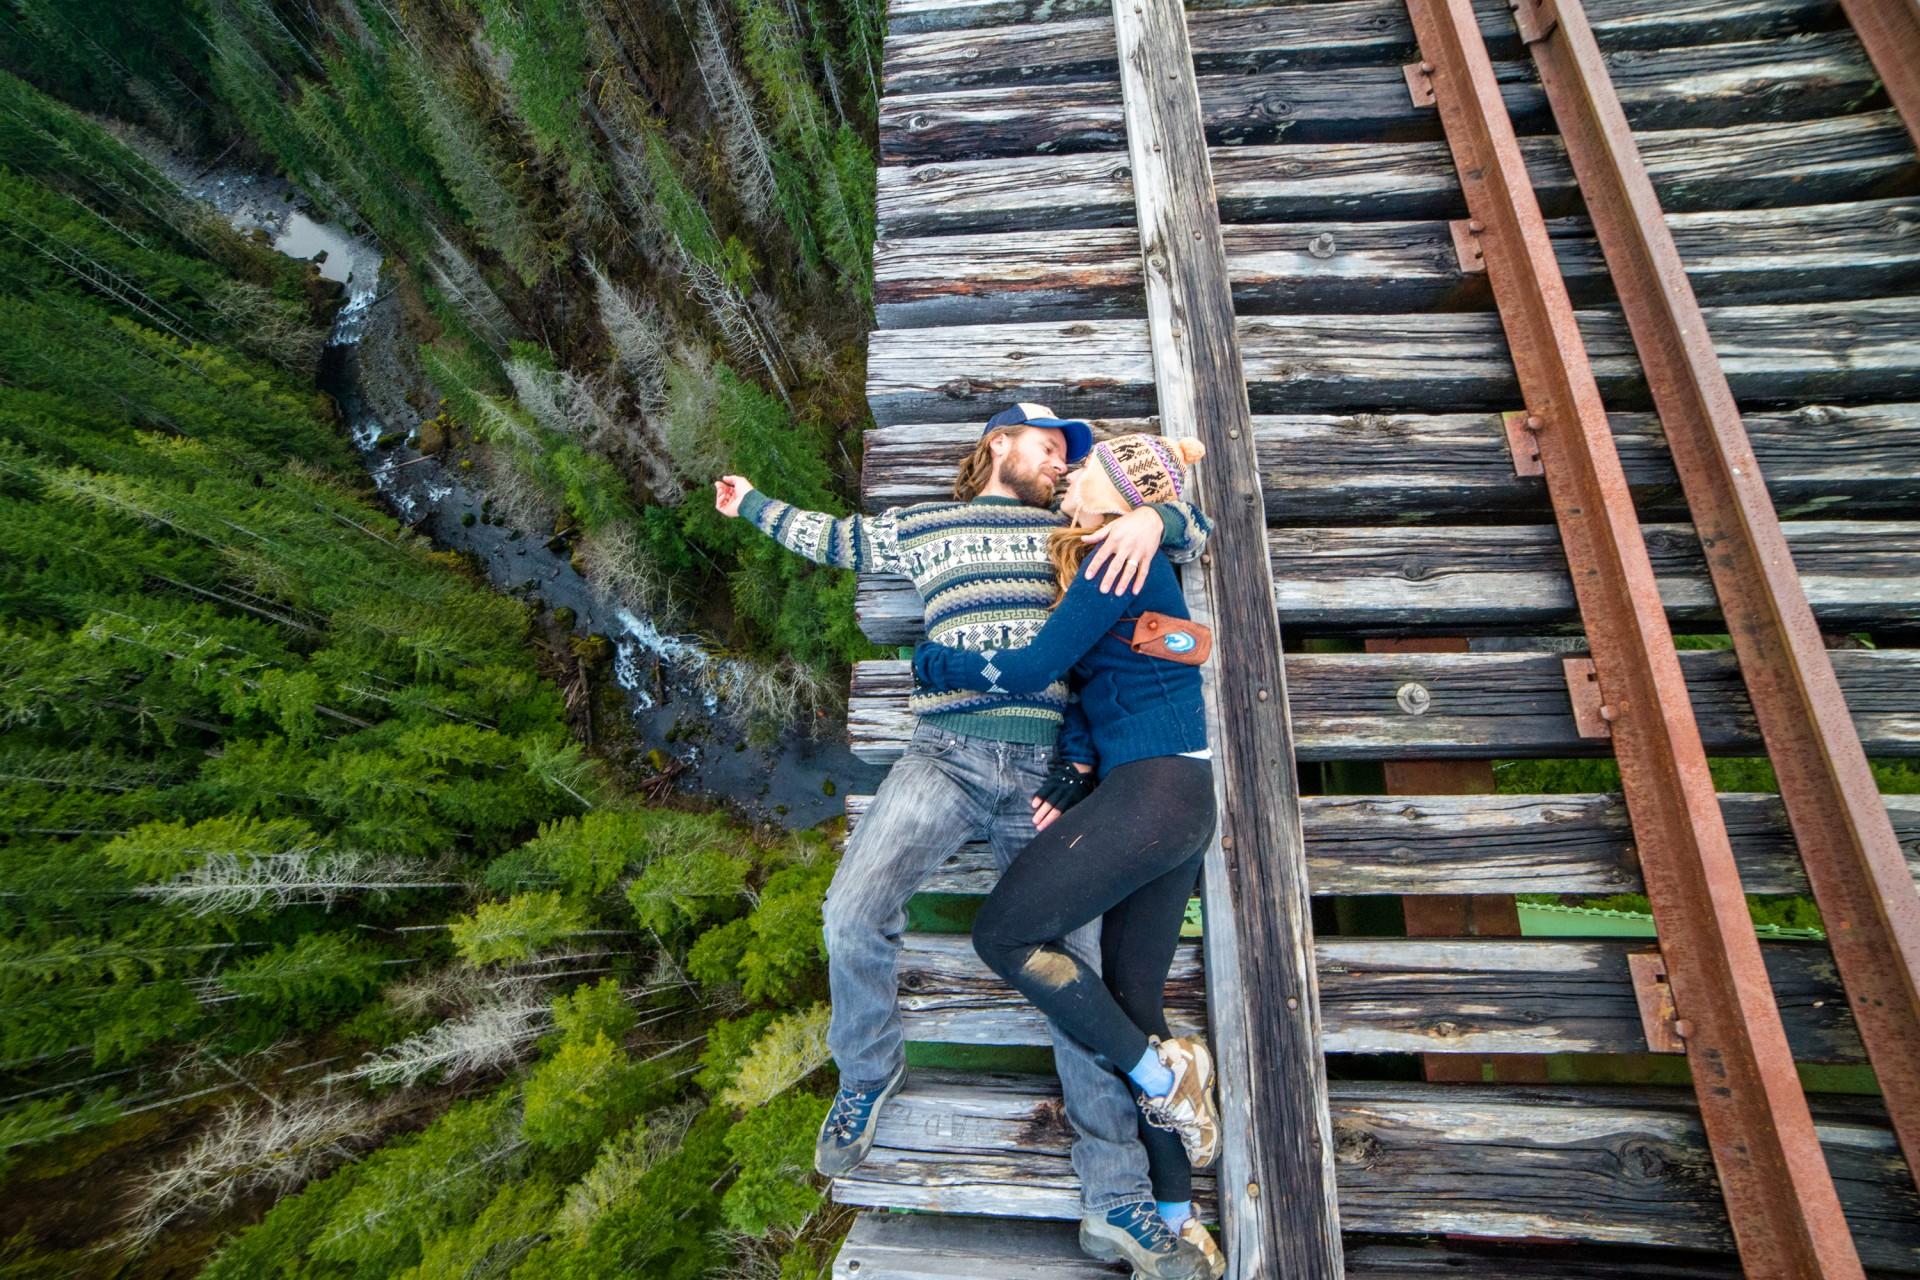 Photographer: Isaac Gautschi. Camera: Nikon D610. Lens: 13mm. Exposure: ISO 2000 f/11 1/100s.